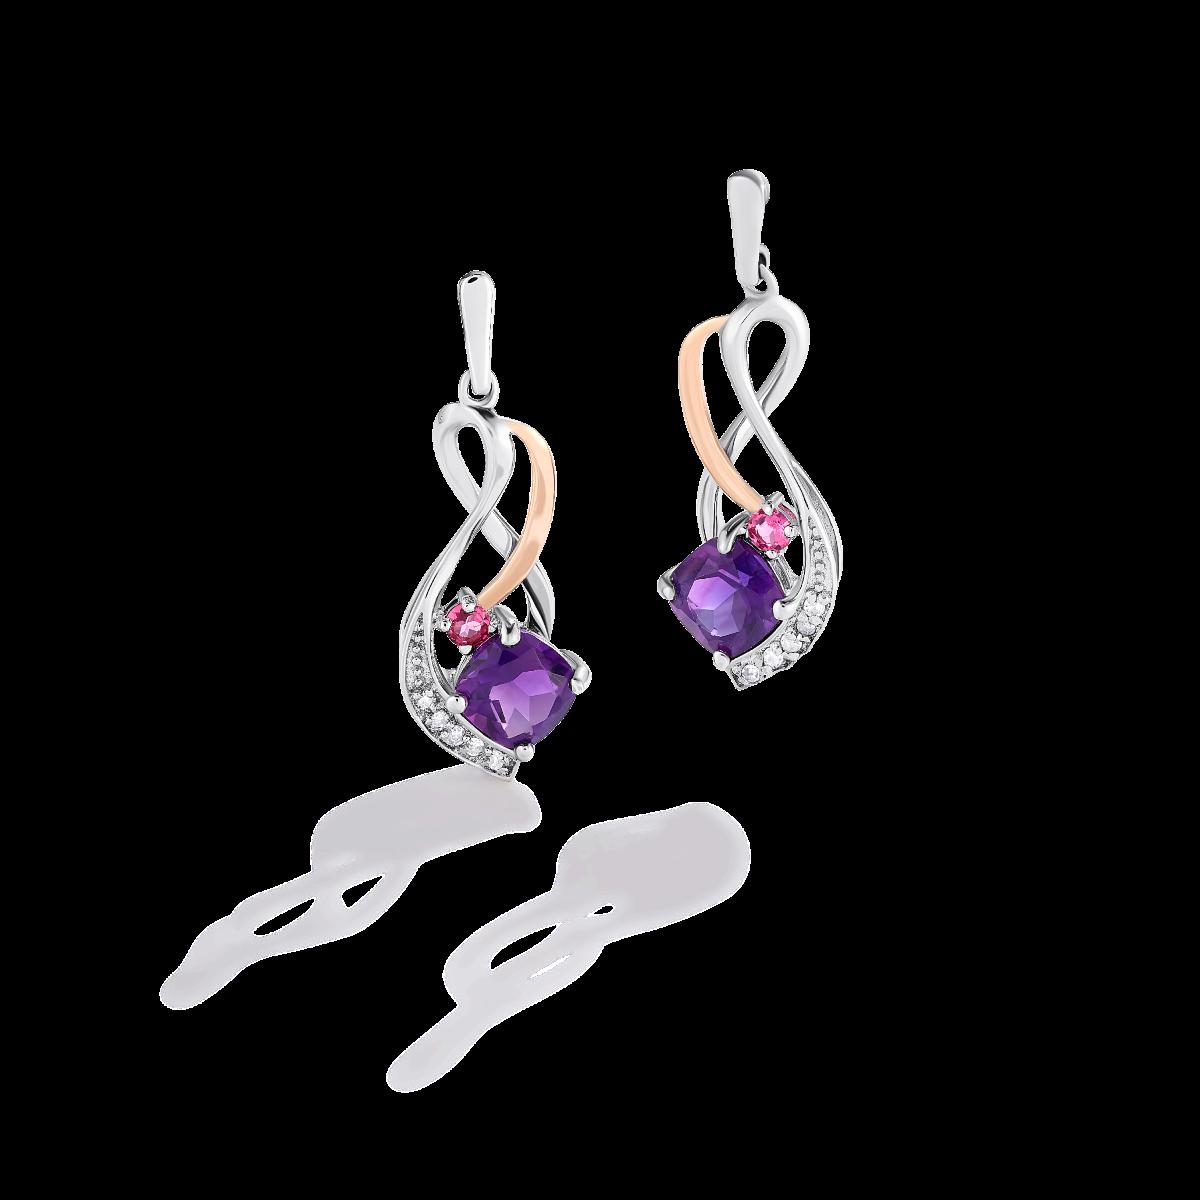 Amethyst & Pink Tourmaline Cushion-Cut Drop Earrings